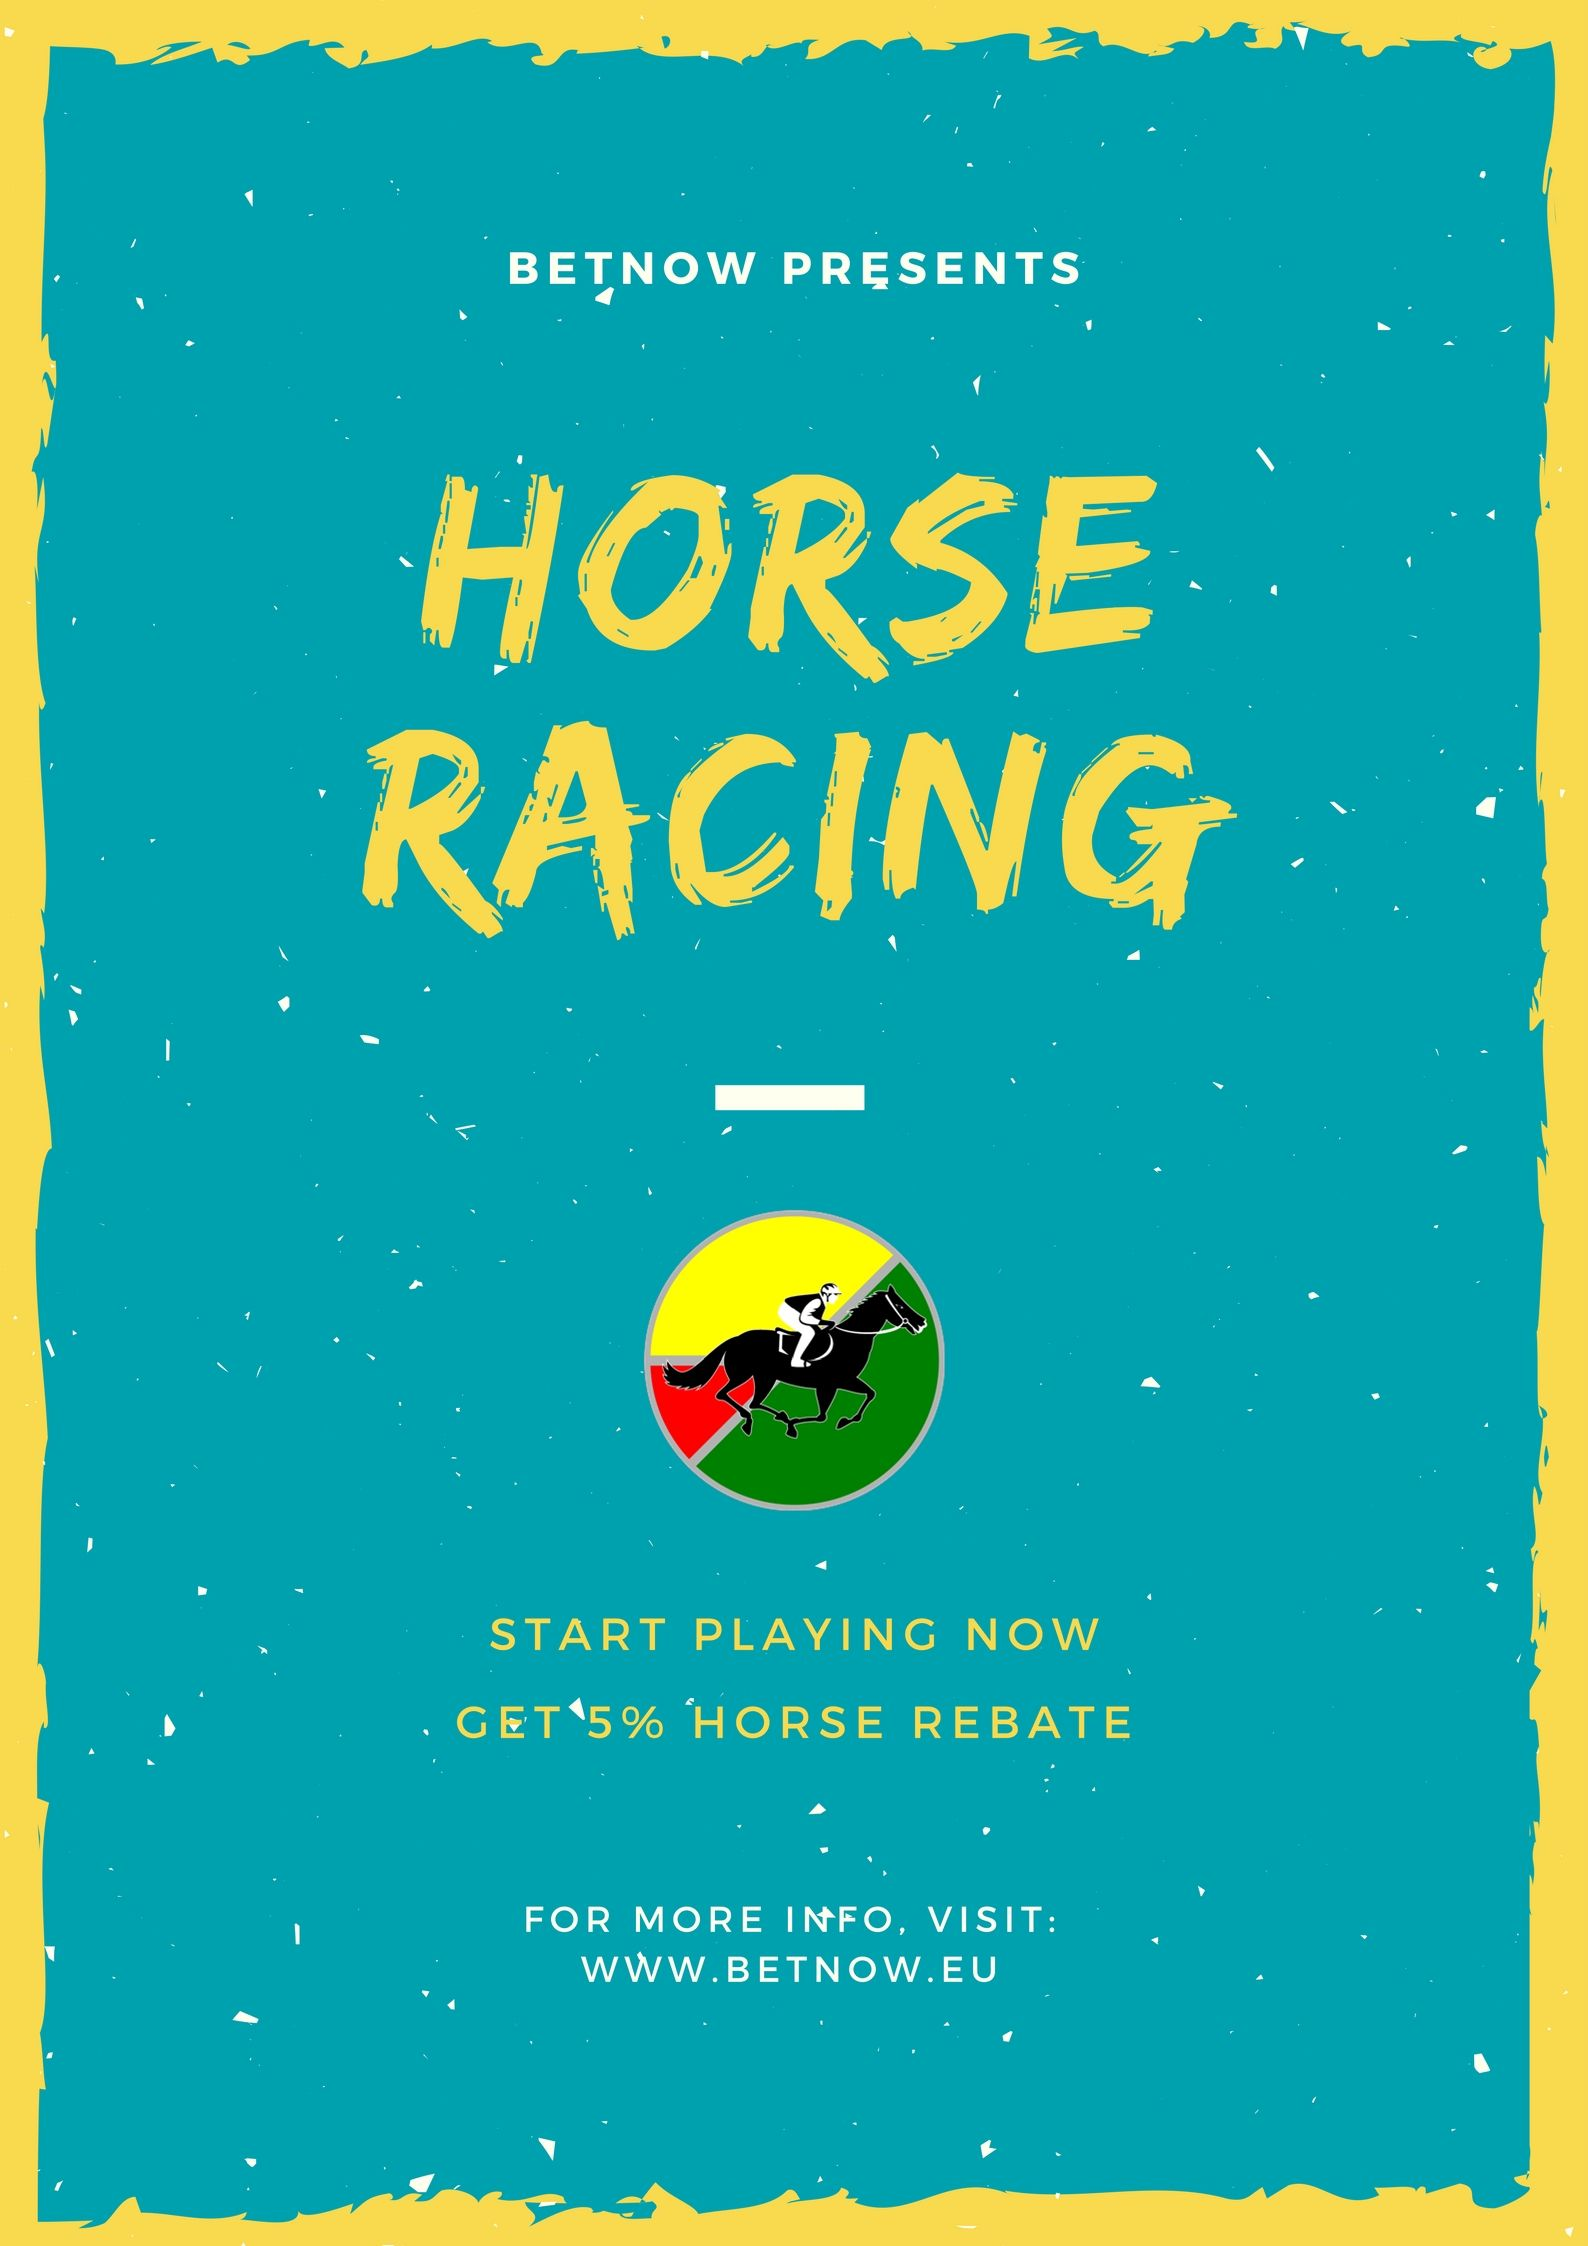 Bet on horse racing online & get 5 horse rebate at Betnow